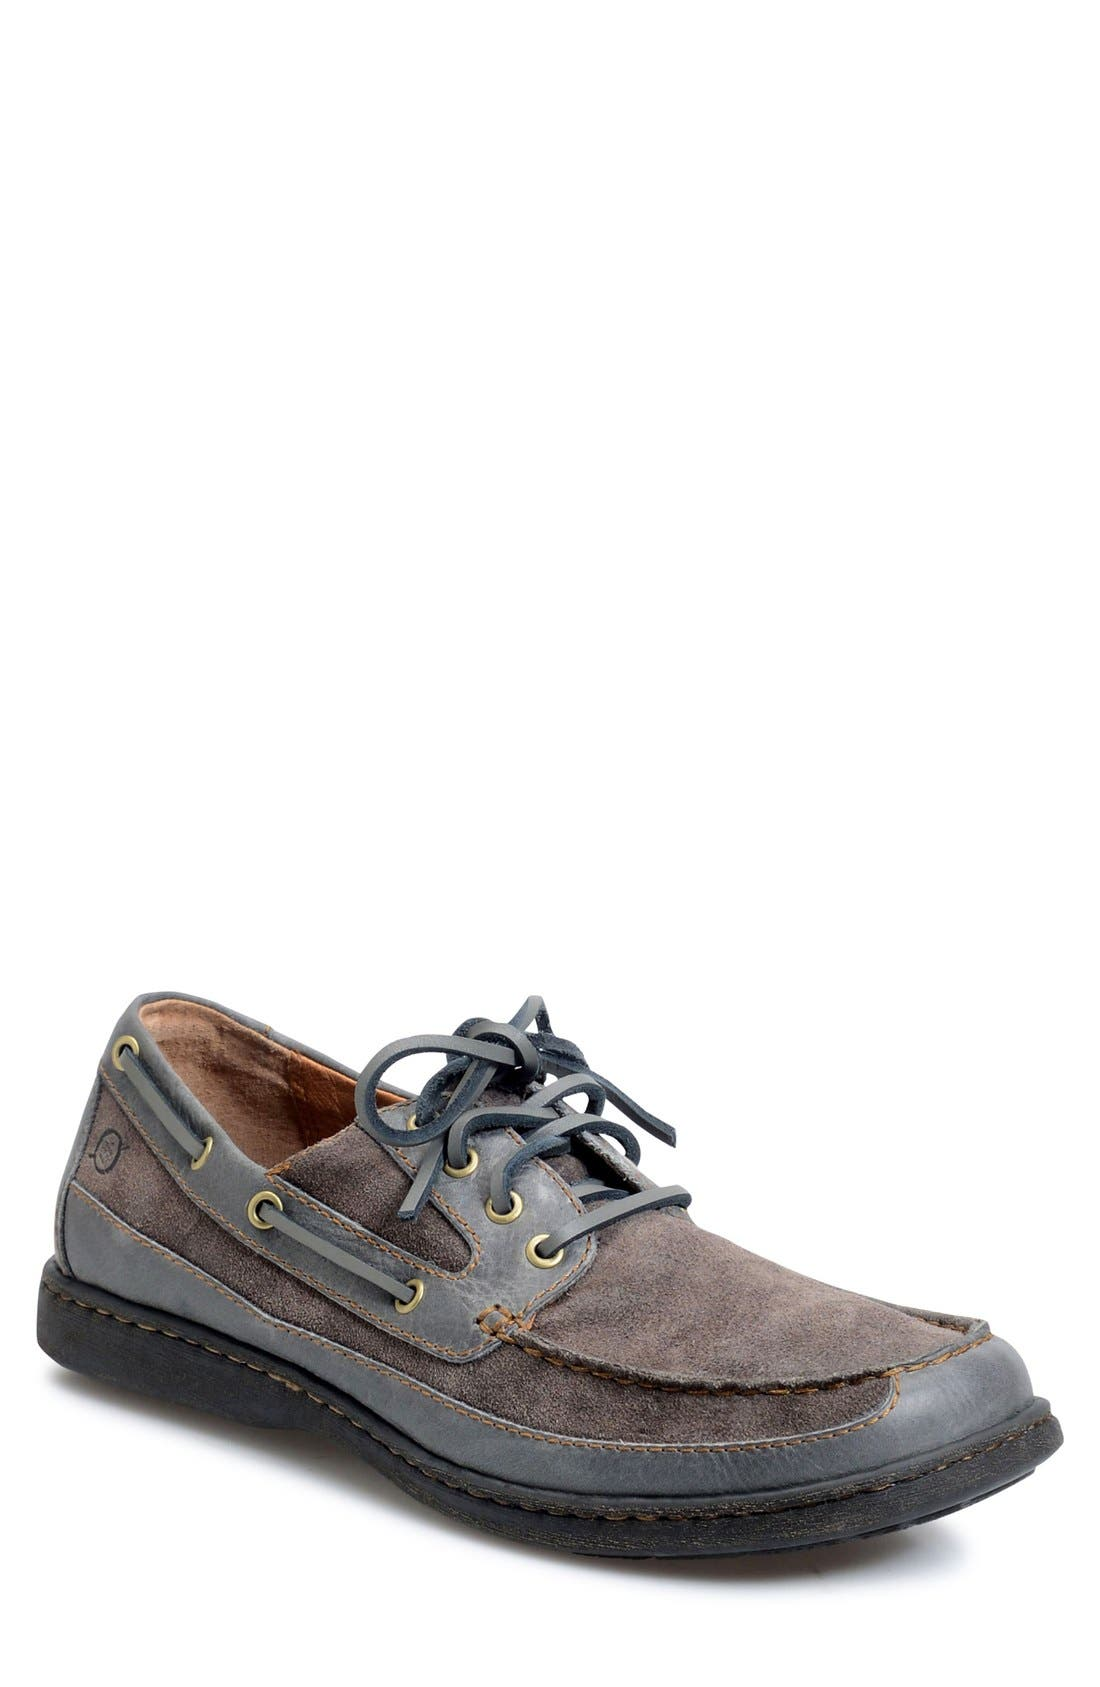 'Harwich' Boat Shoe,                             Main thumbnail 1, color,                             020